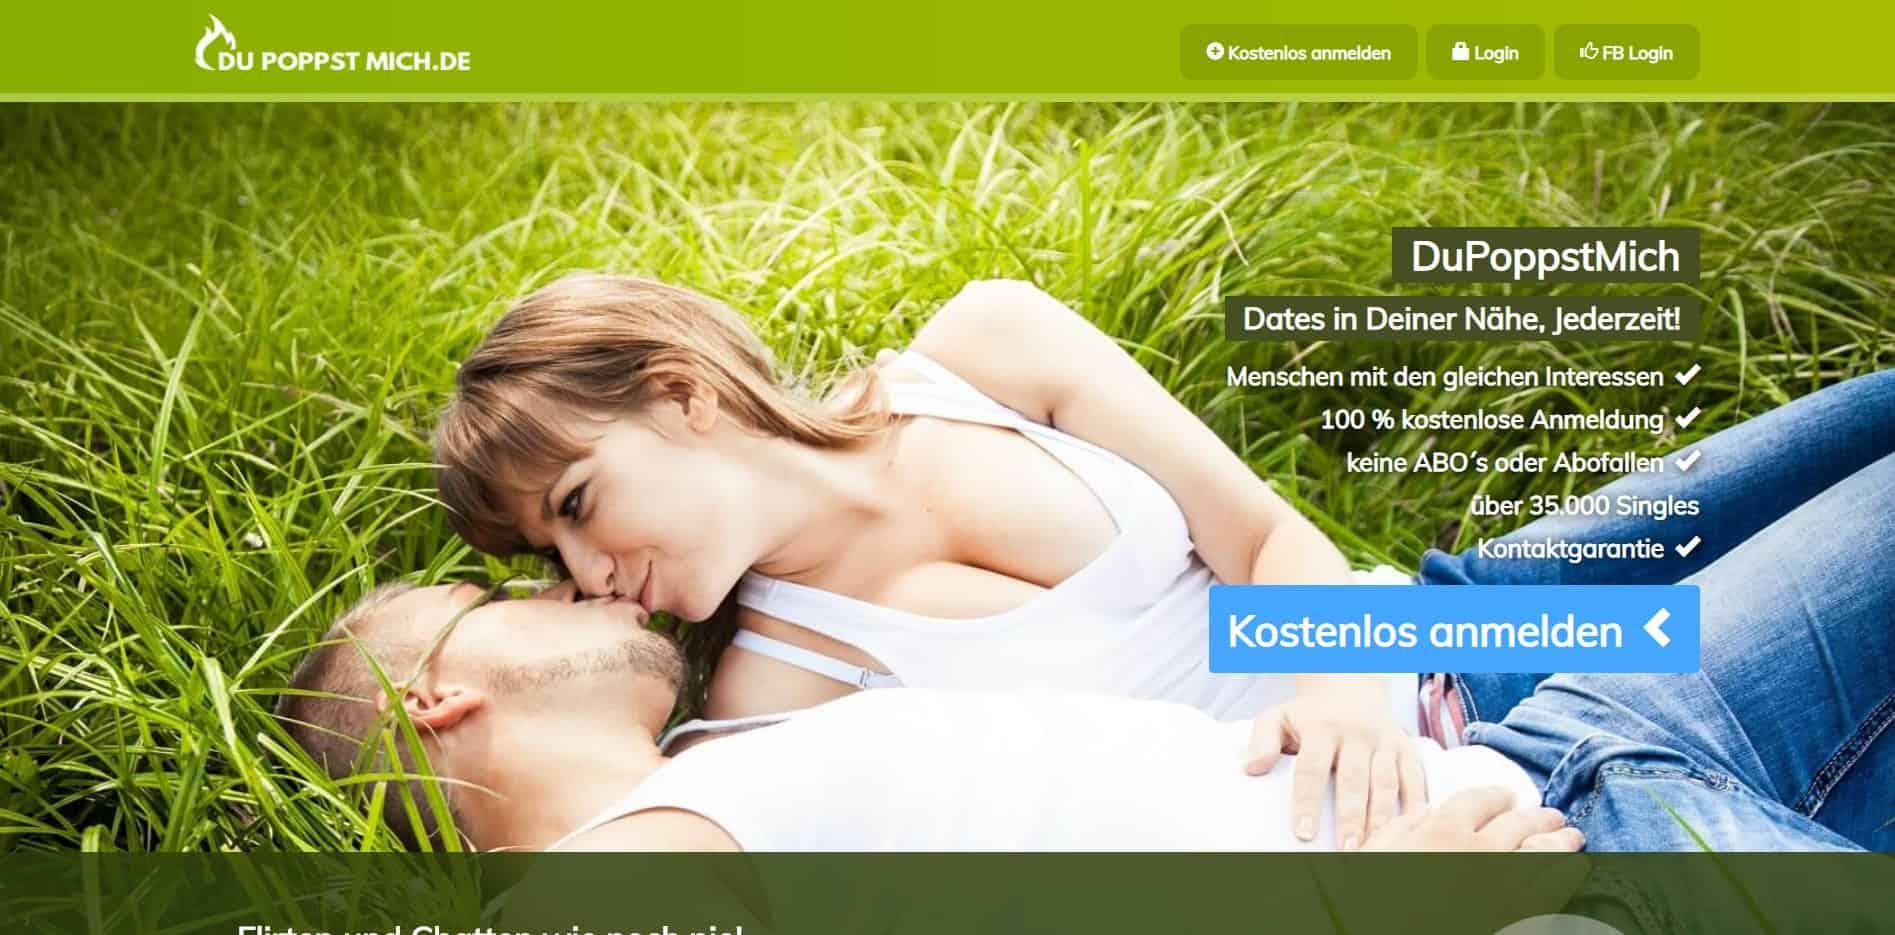 Testbericht: DuPoppstMich.de Abzocke